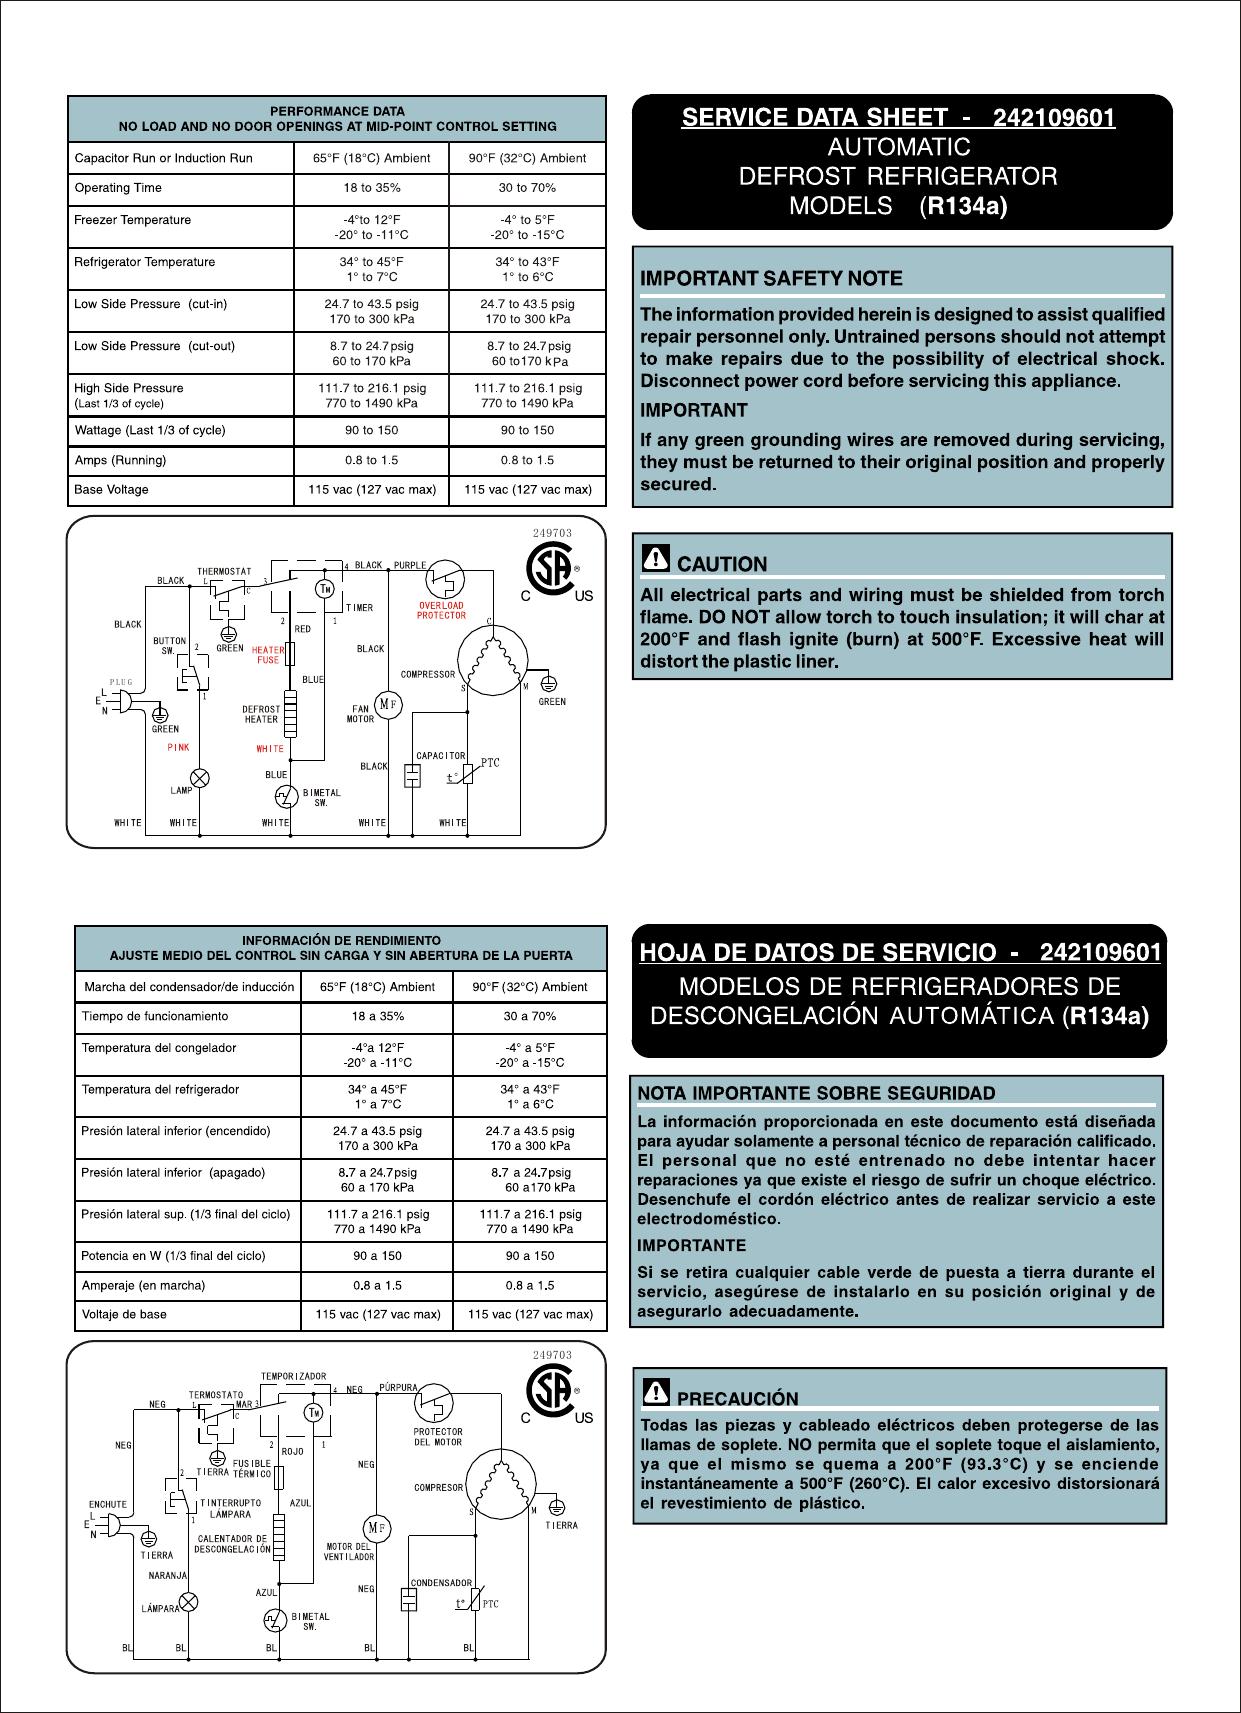 Frigidaire Ffps4533qm Wiring Diagram Lfph45f4lm 4 Wire